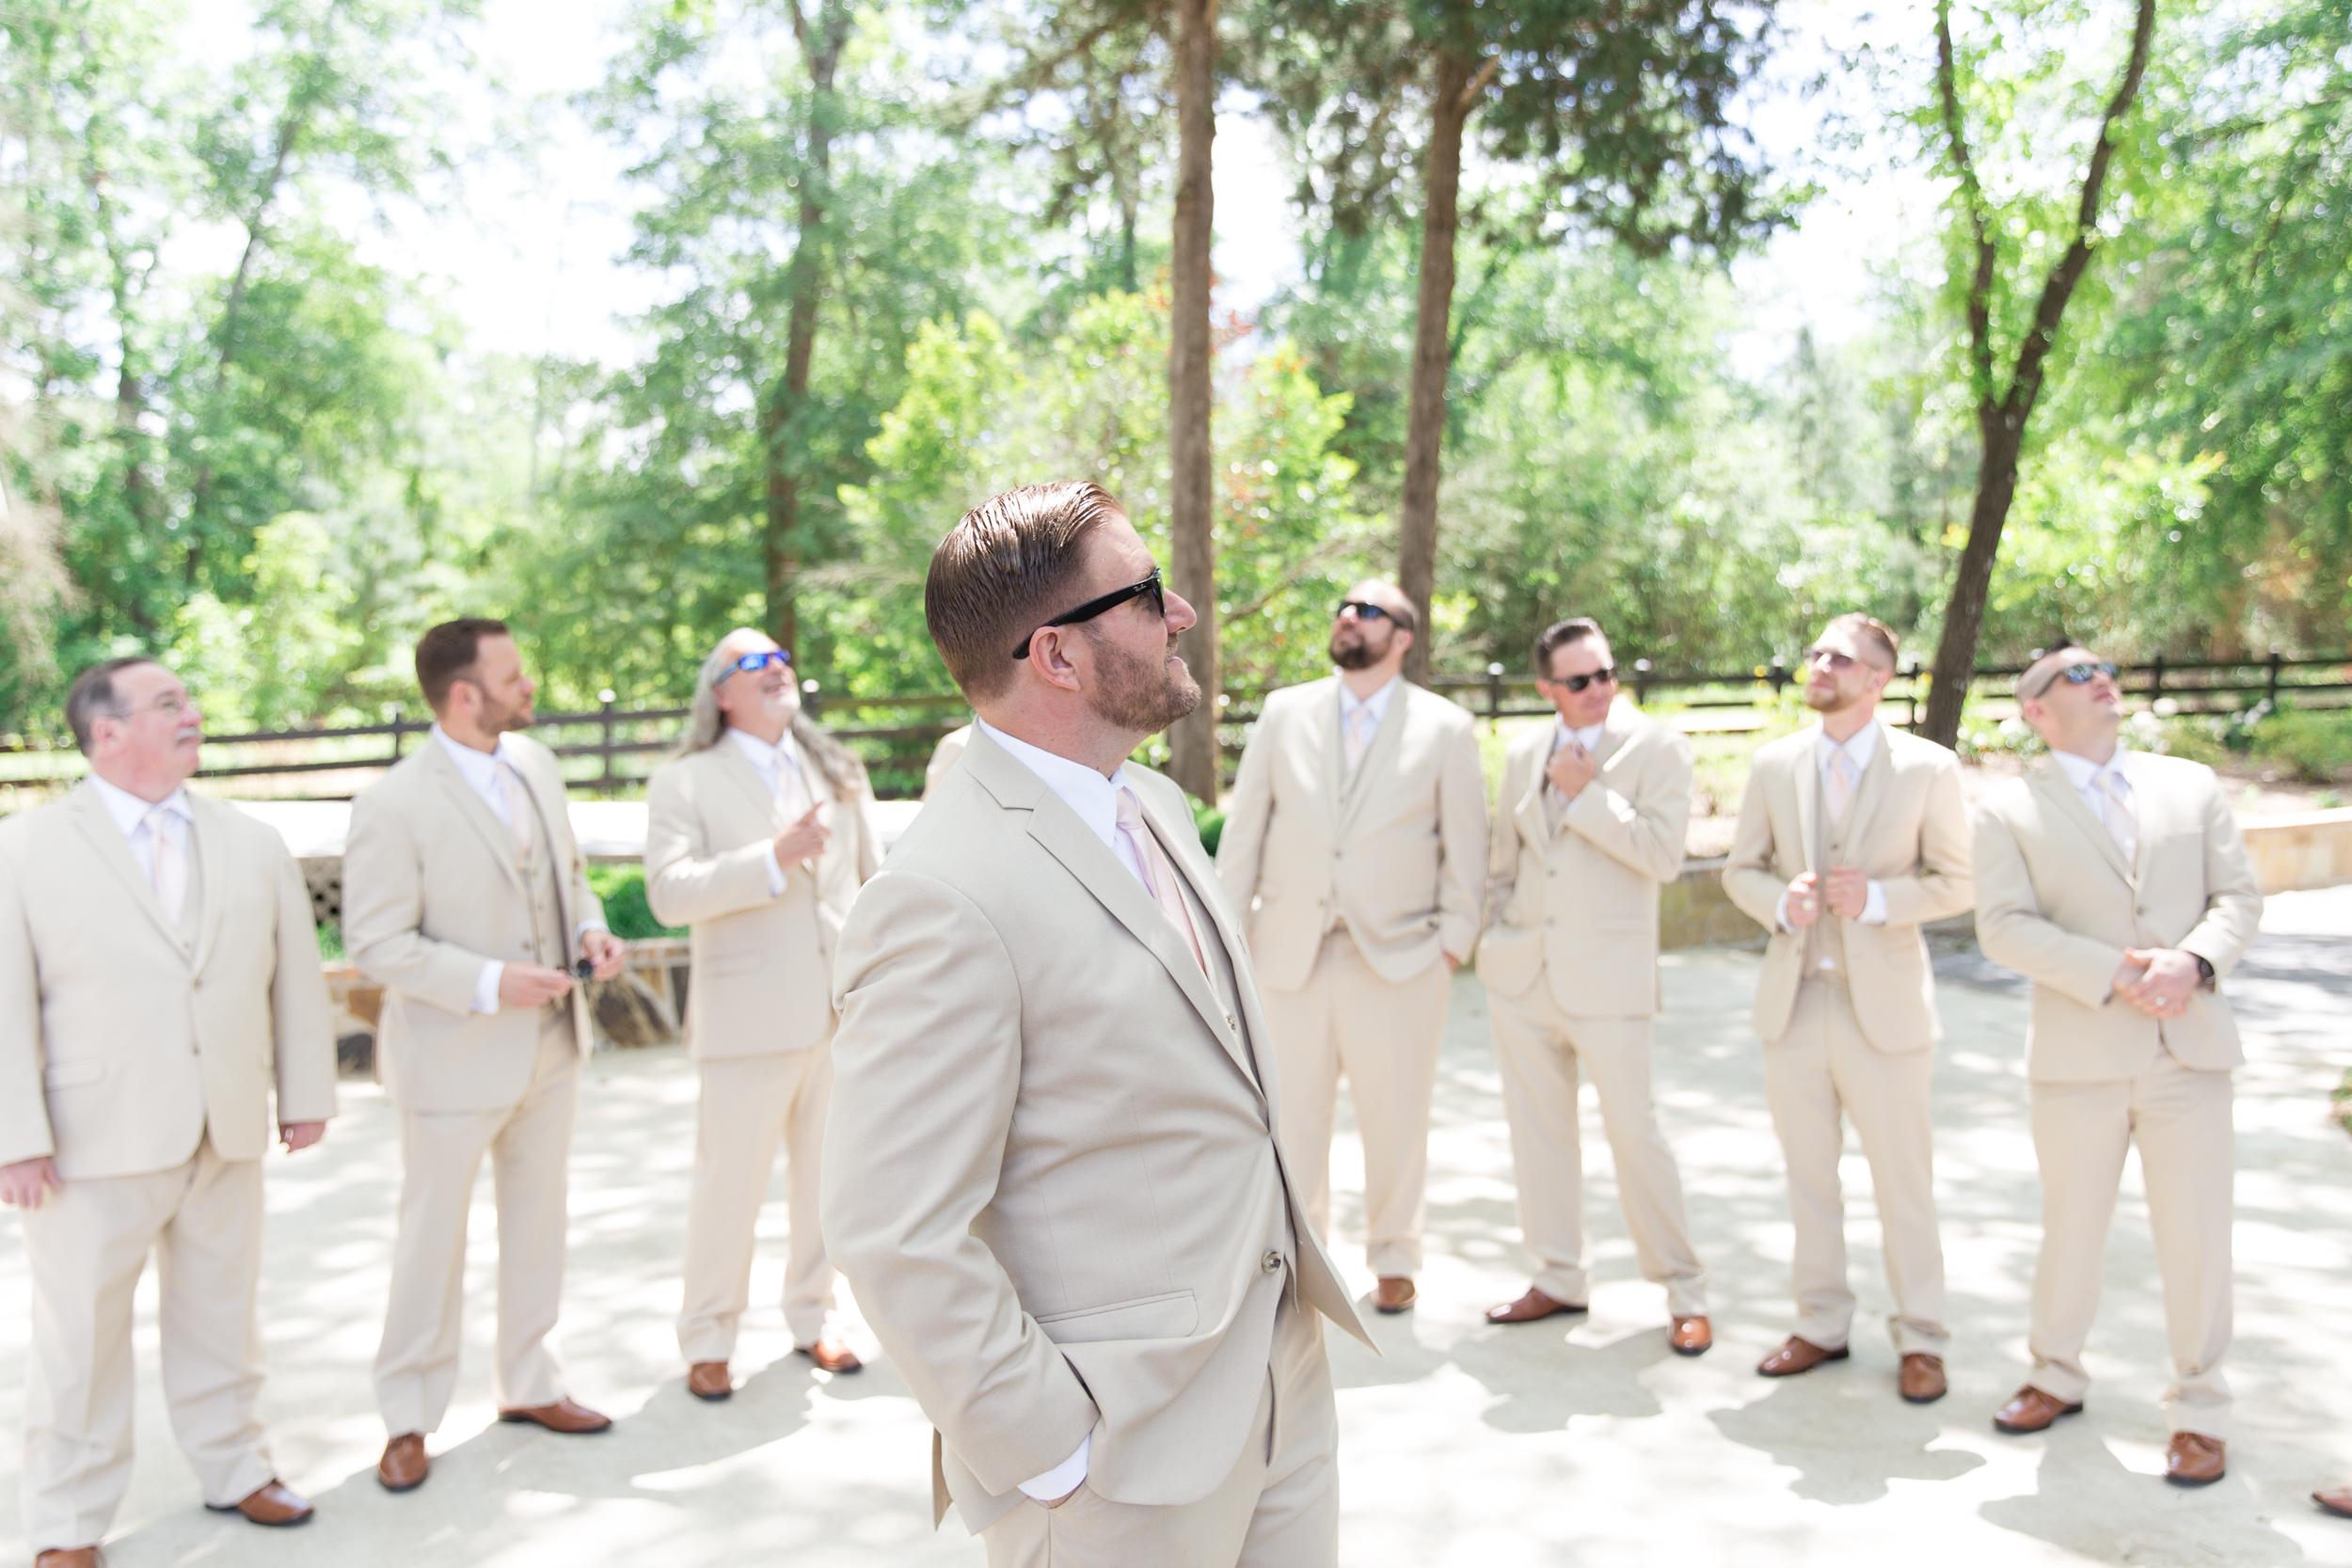 Zihlman-East TX Wedding_Kelsie Hendricks Photography_The Folmar Tyler Texas-14.jpg